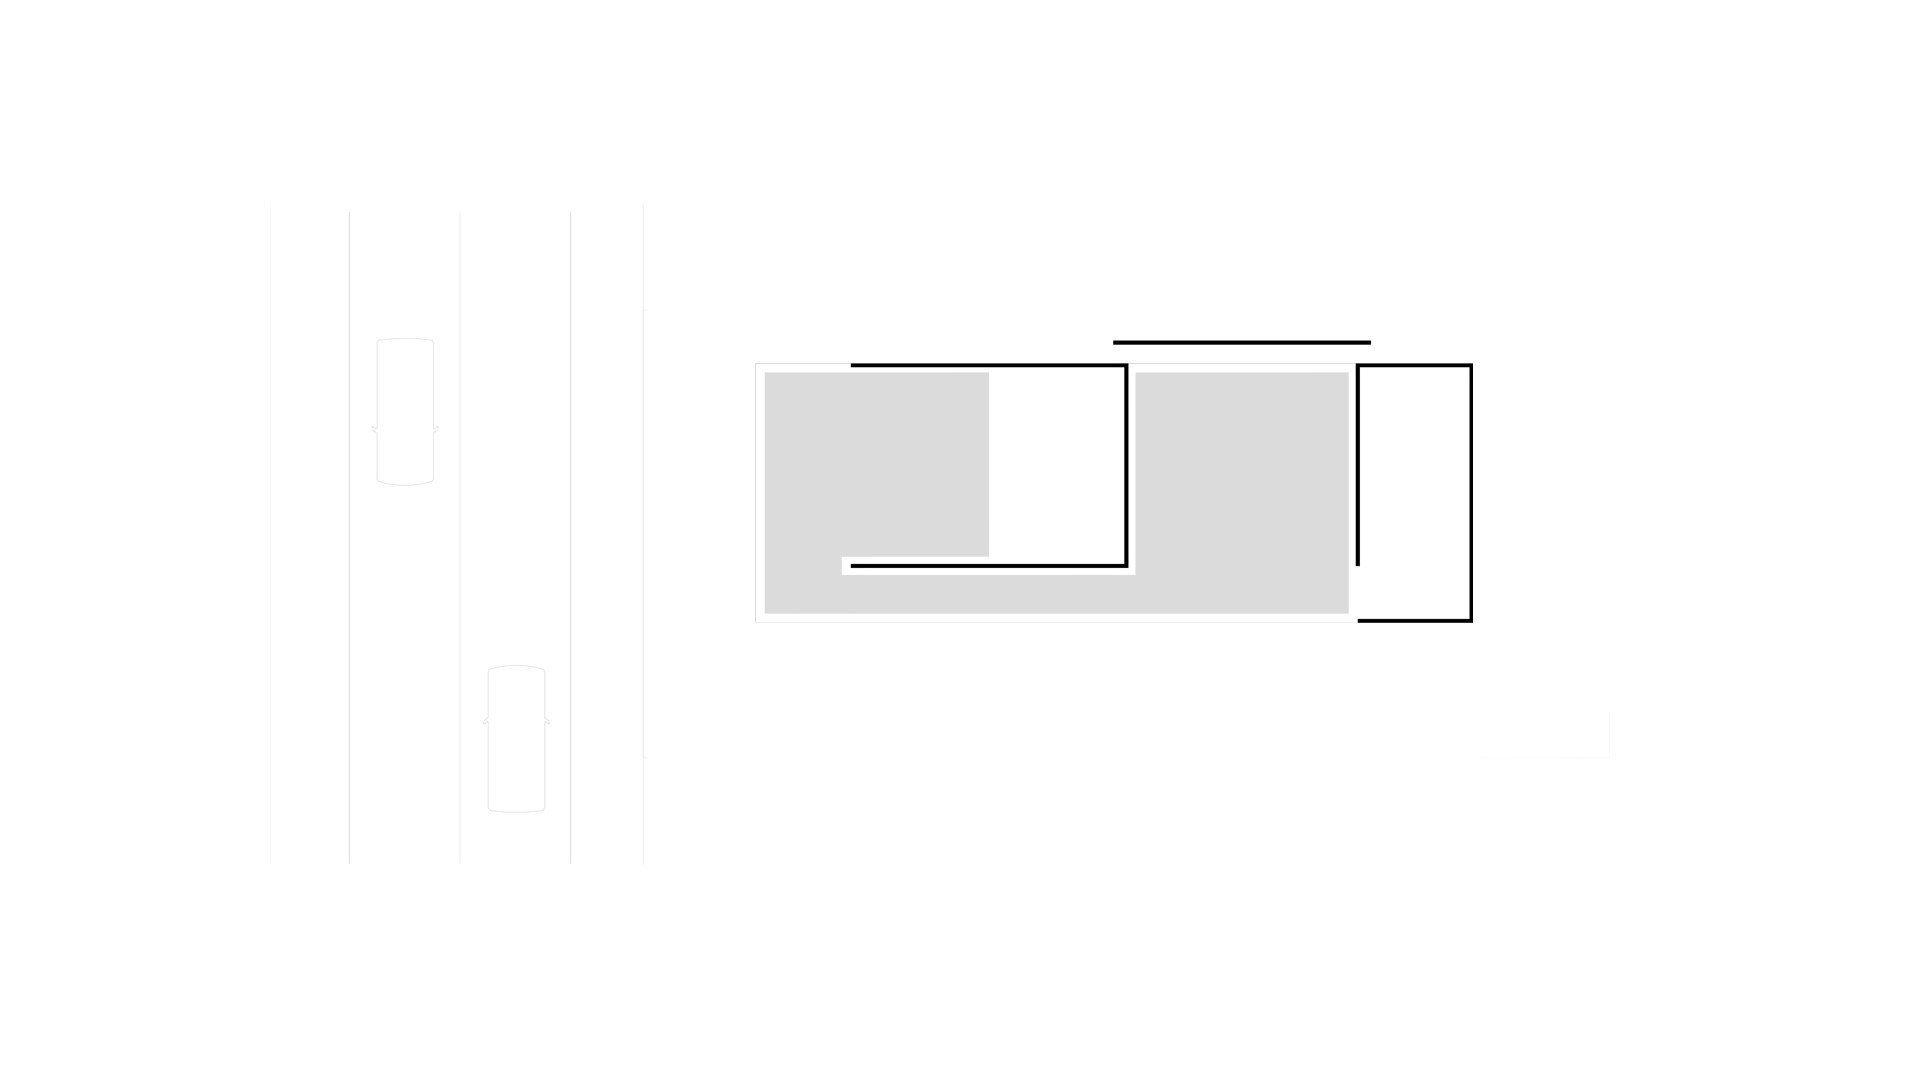 aruana-diagrama-de-varandas